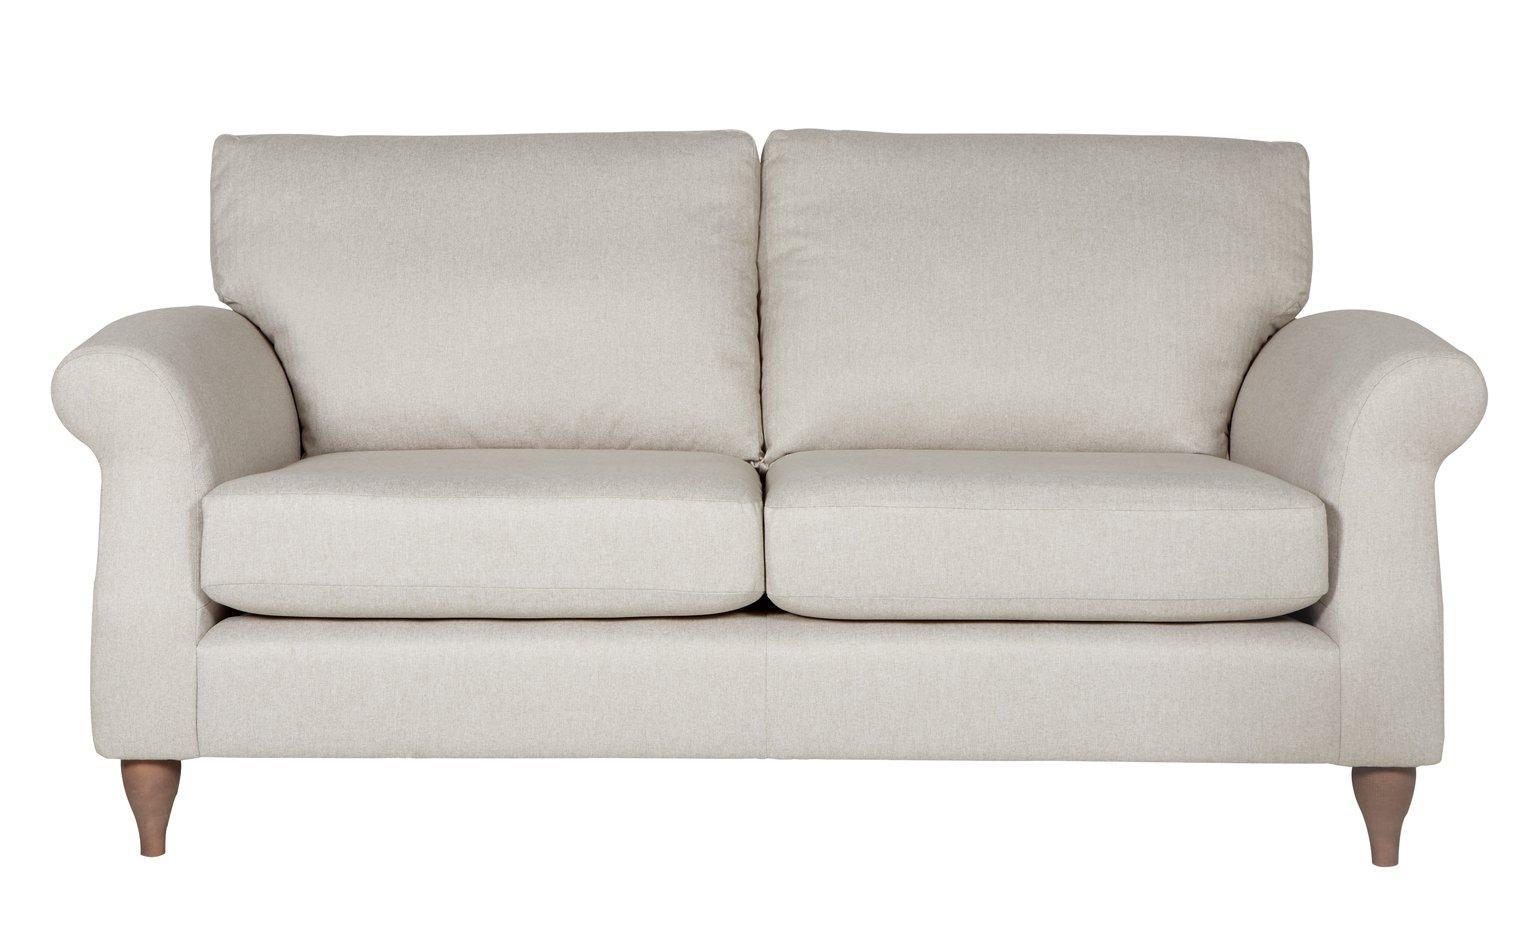 Argos Home Bude 3 Seater Fabric Sofa - Natural